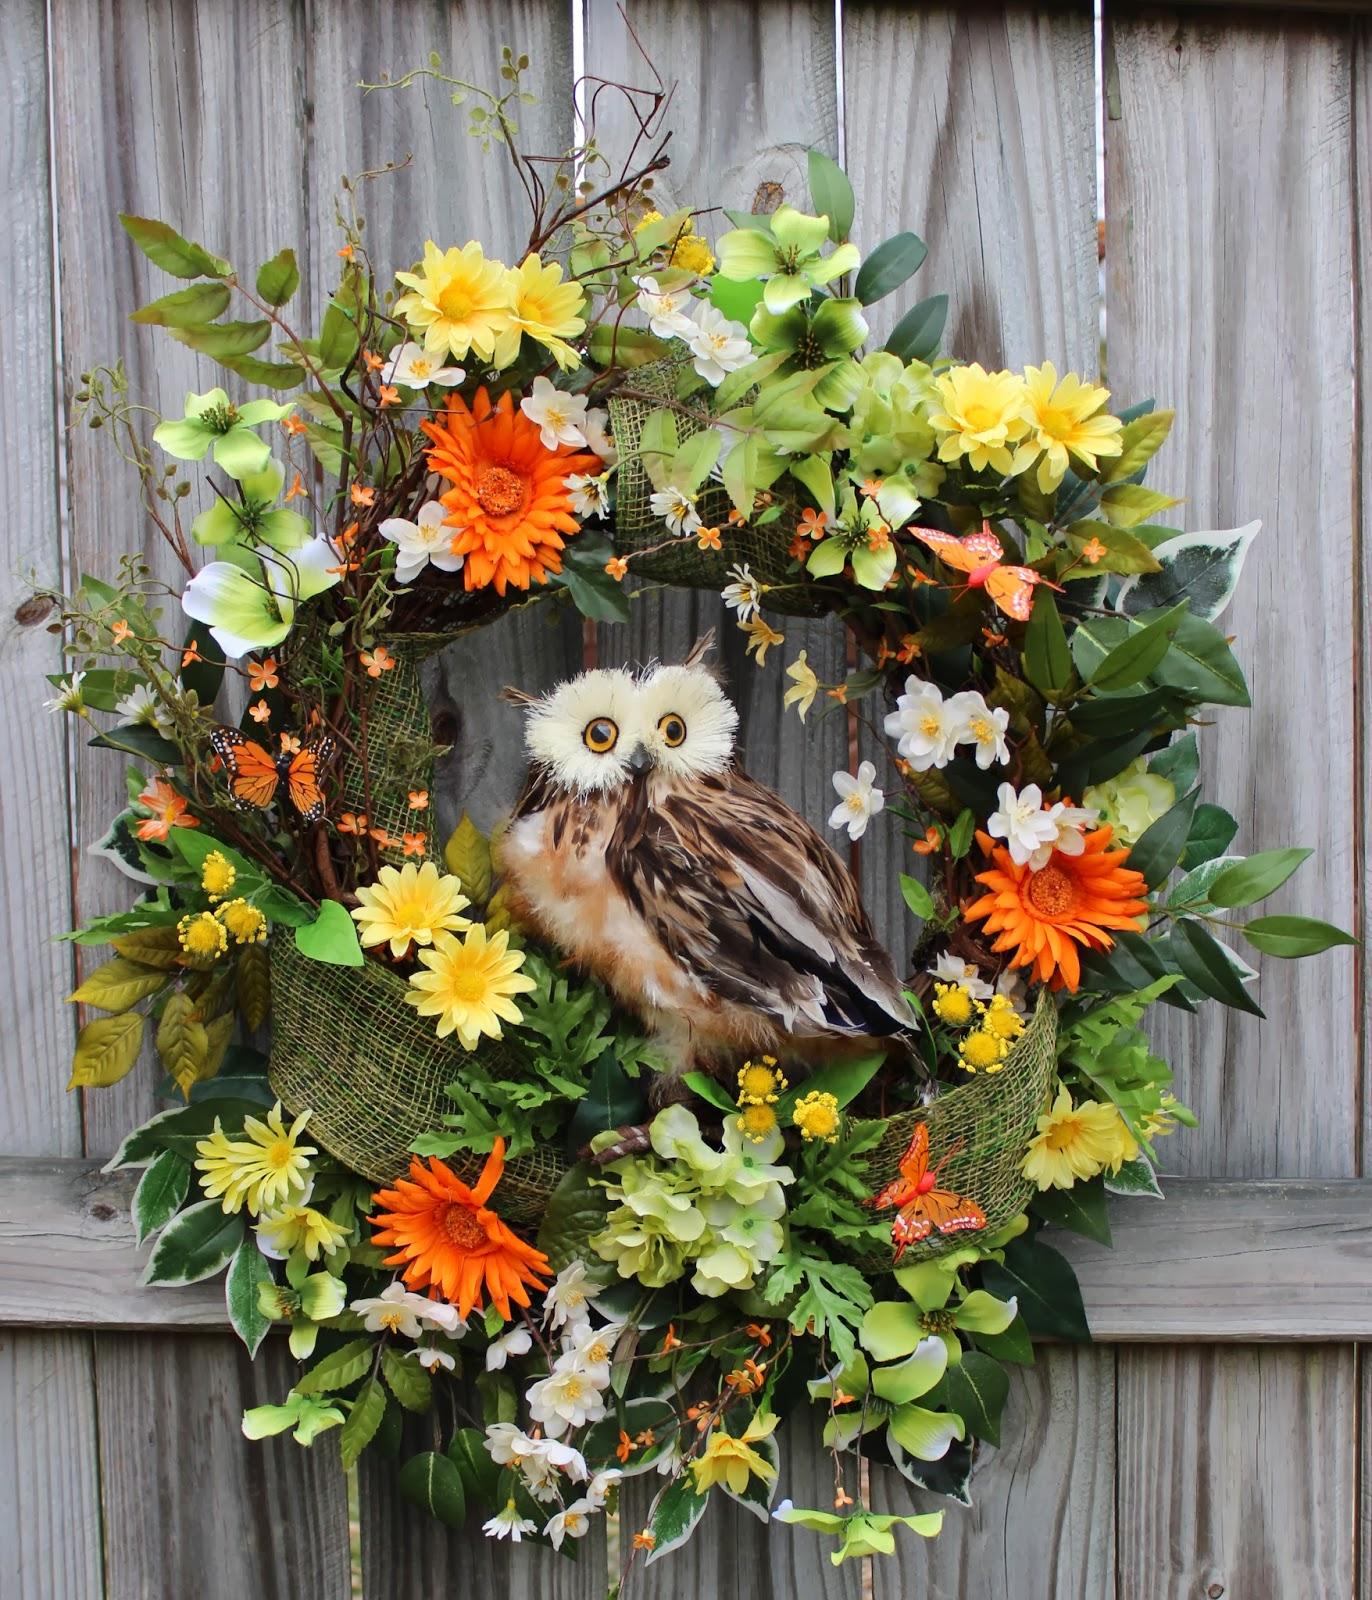 Spring in Bloom Owl Wreath, Large Brown Feather Owl, Gerbera Daisy XXL, Summer, Orange, yellow, Green, Burlap